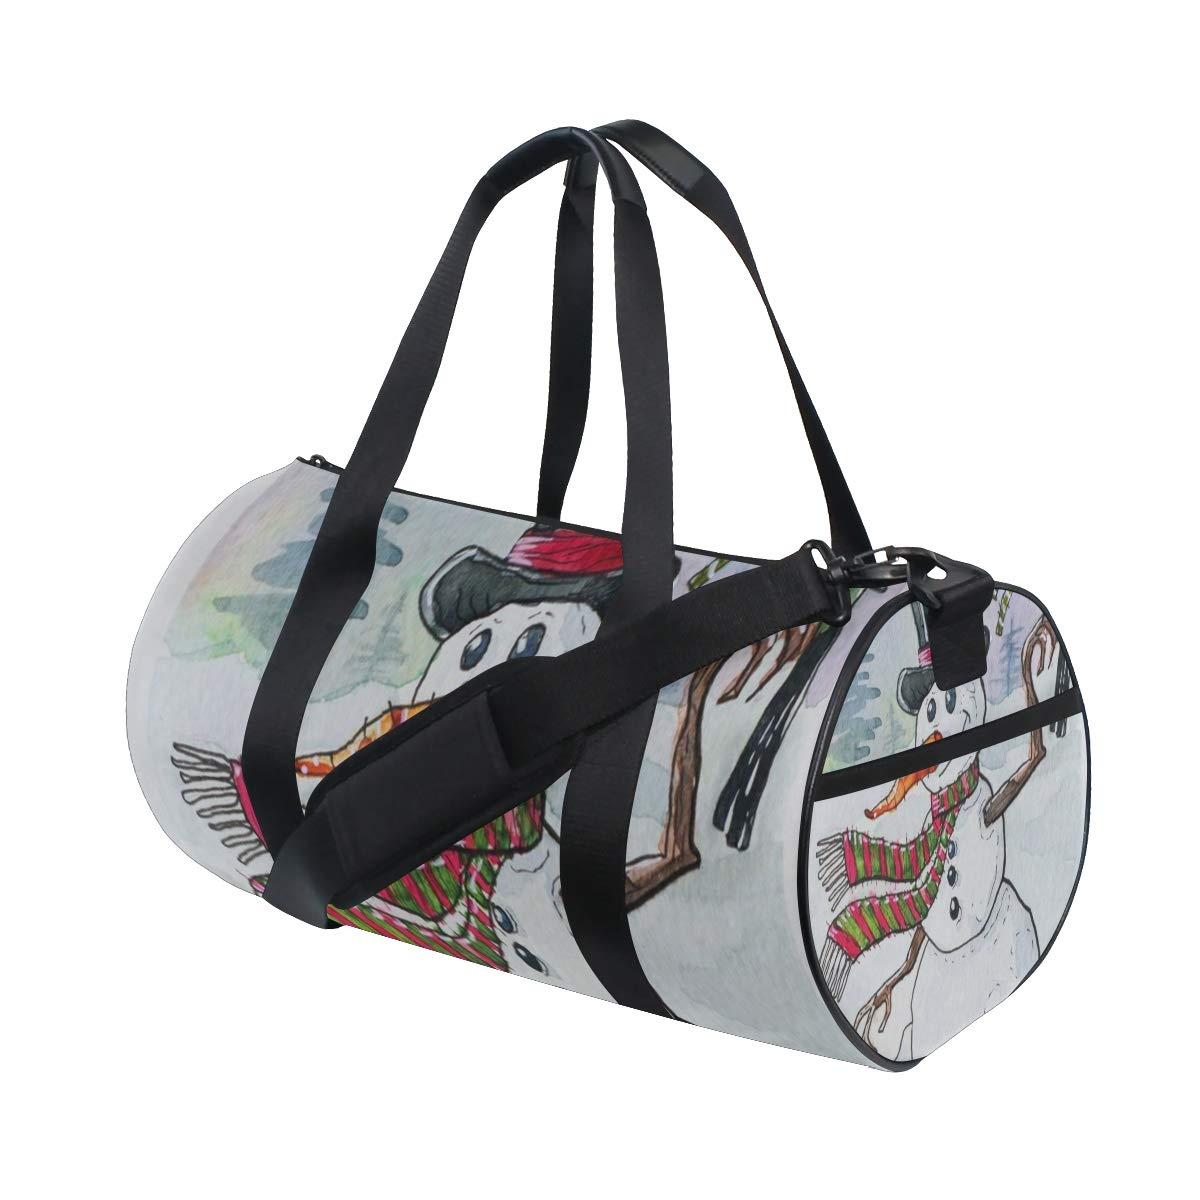 OuLian ジムバッグ レトロオーストラリア国旗 レディース キャンバスダッフルバッグ 女の子用キュートなスポーツバッグ One Size picture2 B07NRQTN3K